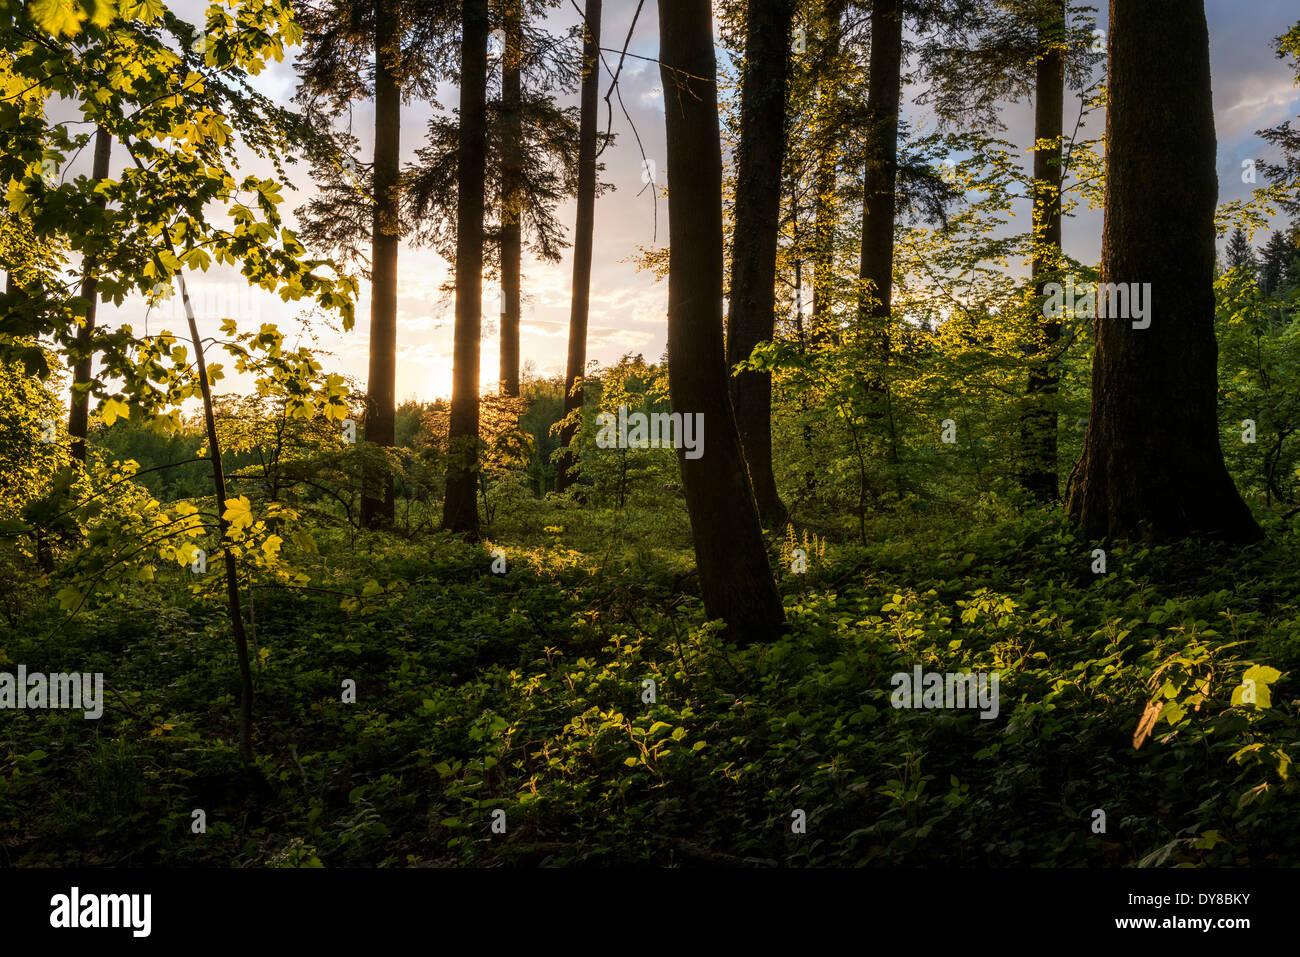 Tree, leaves, trees, spring, back light, beam of light, nature, Switzerland, Europe, shrub, bush, wood, forest, light - Stock Image